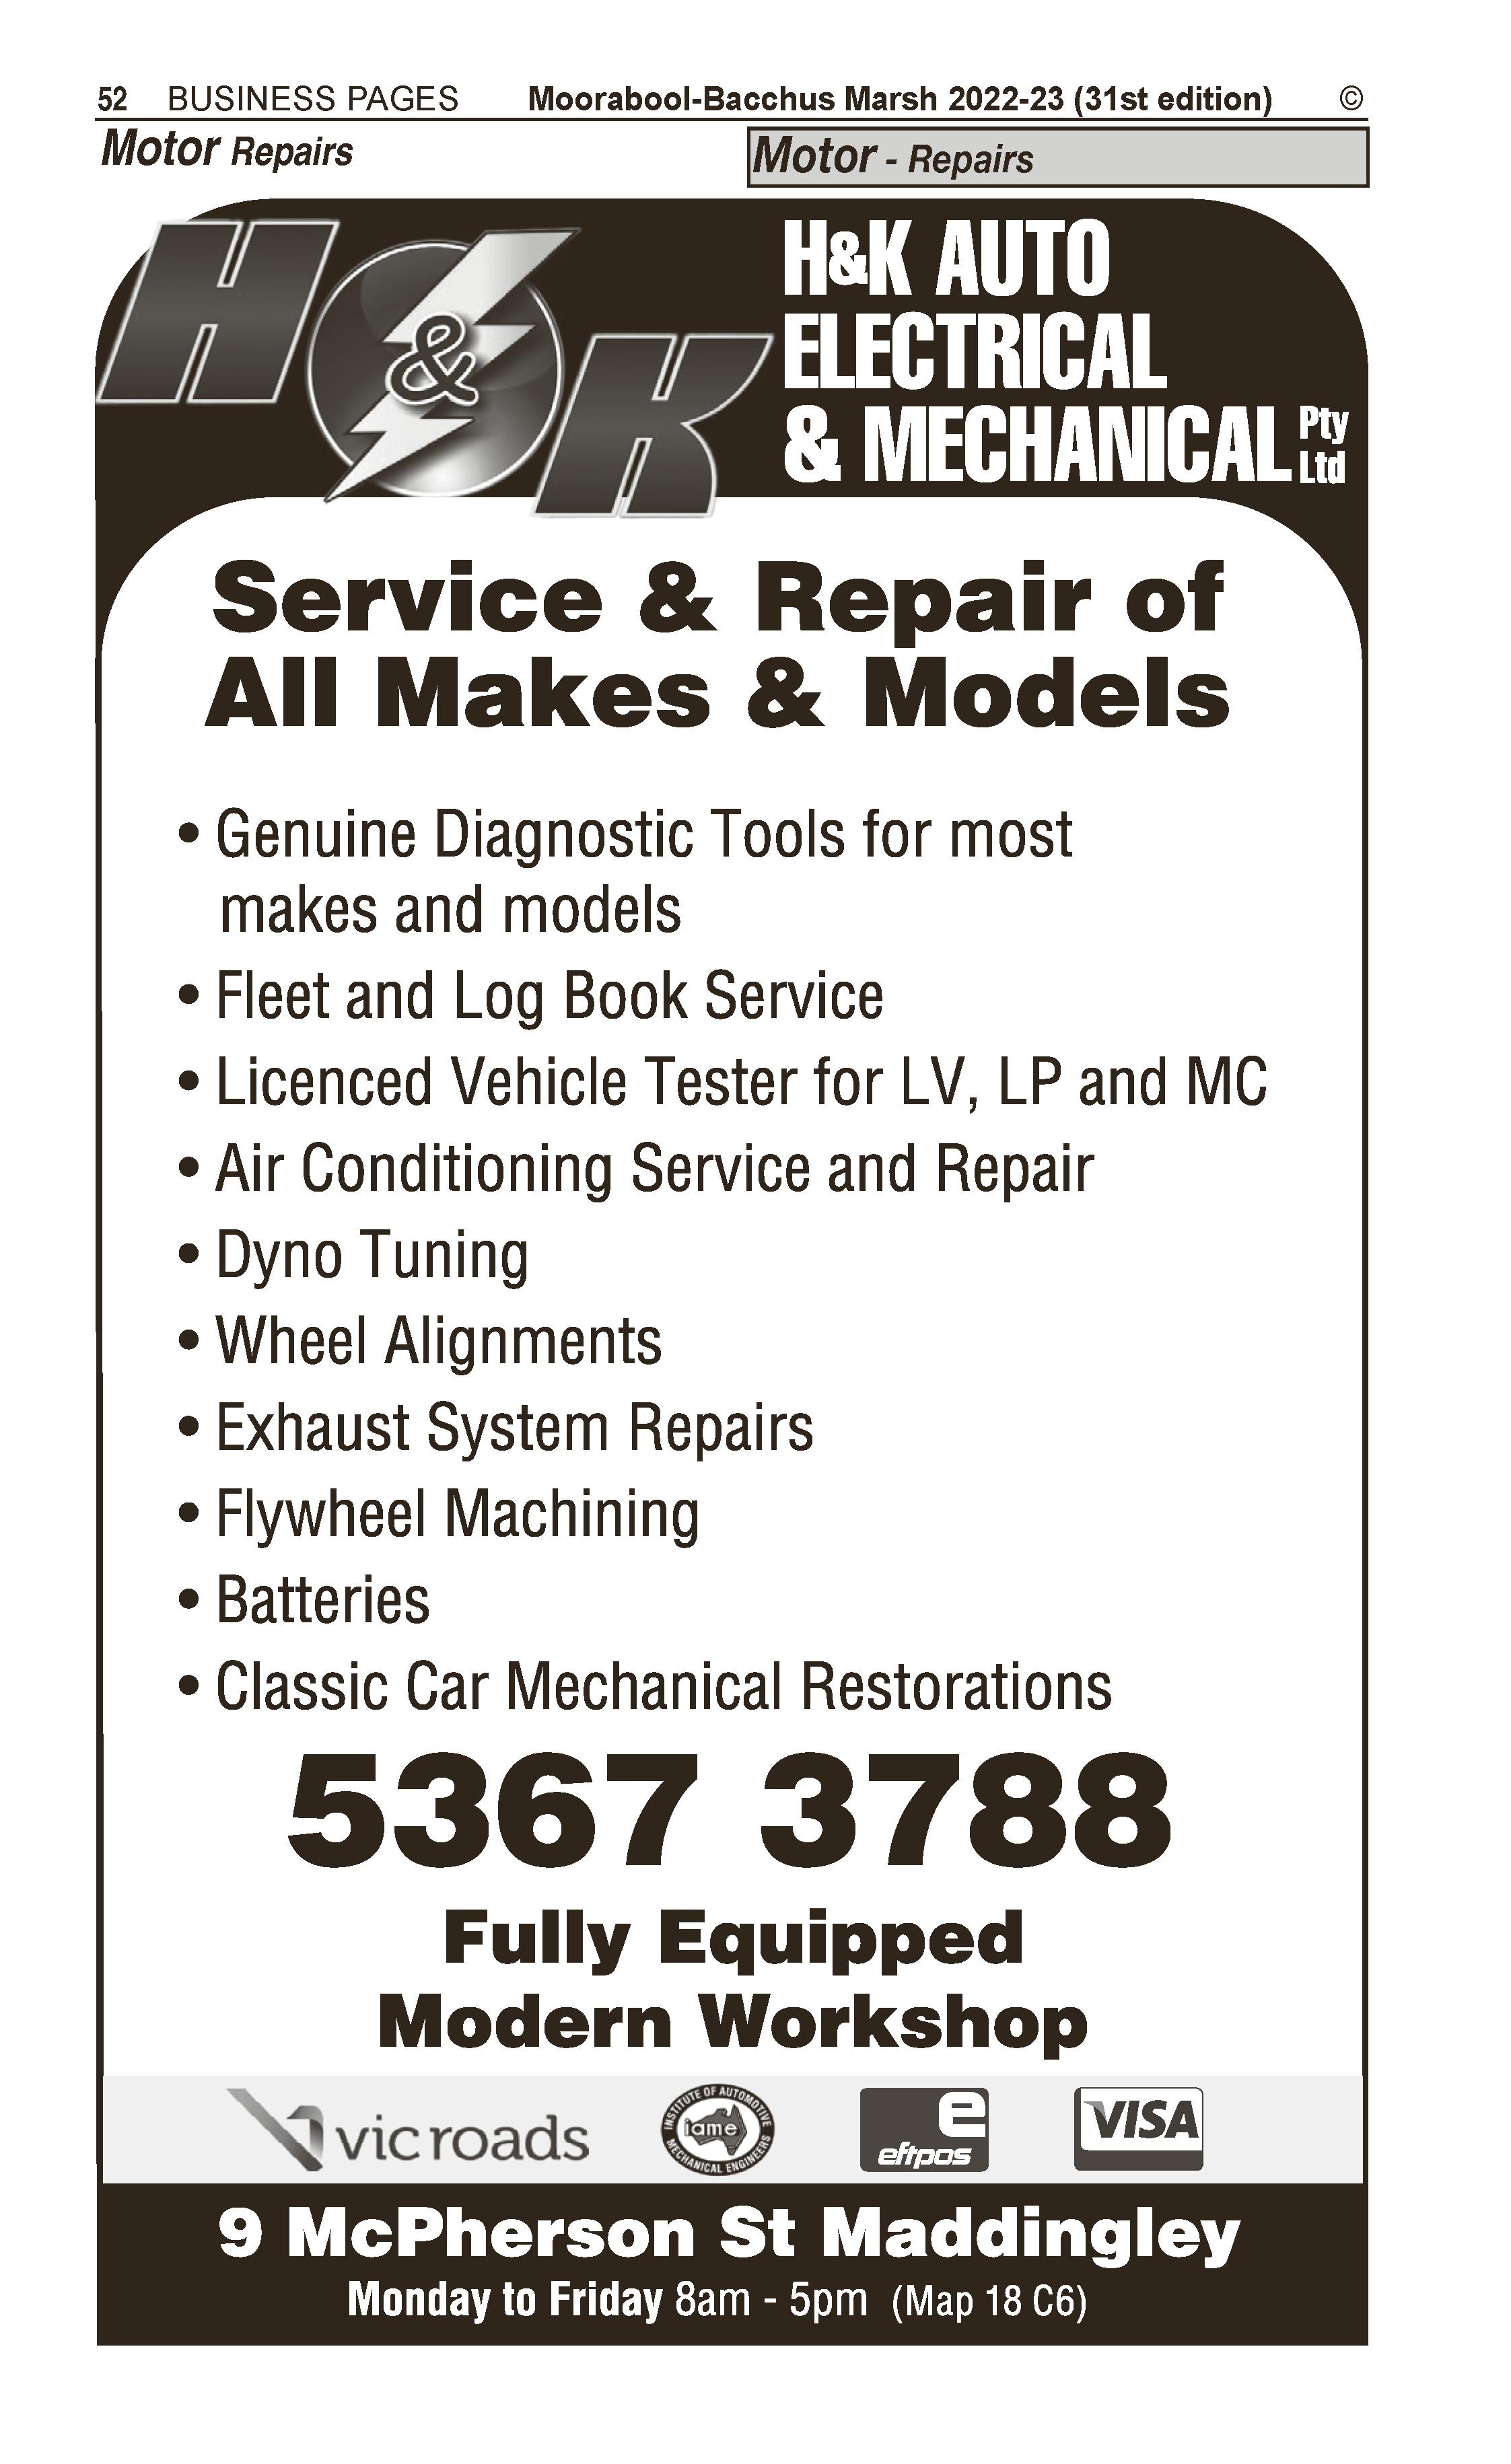 2UA Bros Pty Ltd in Darley VIC - page 52